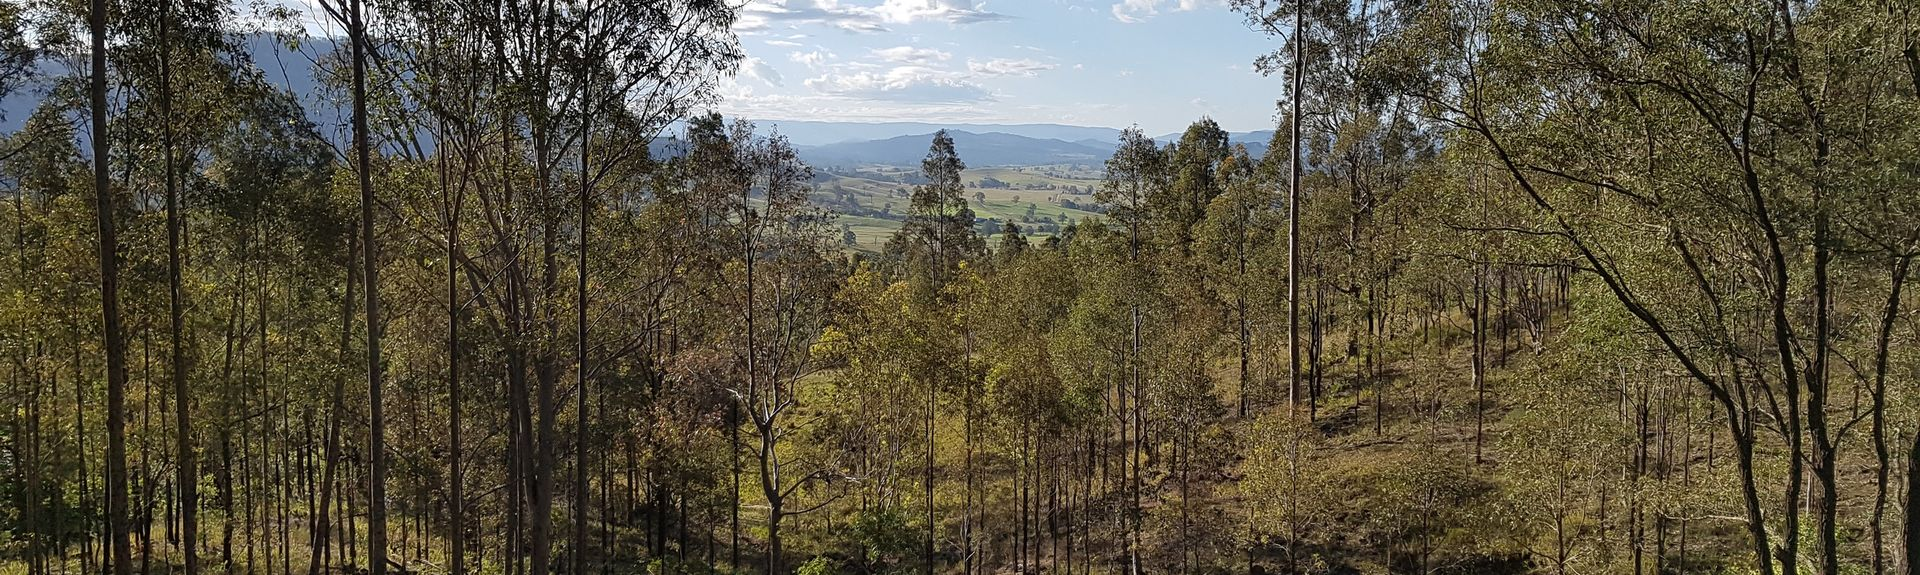 Rosebrook, NSW, Australia